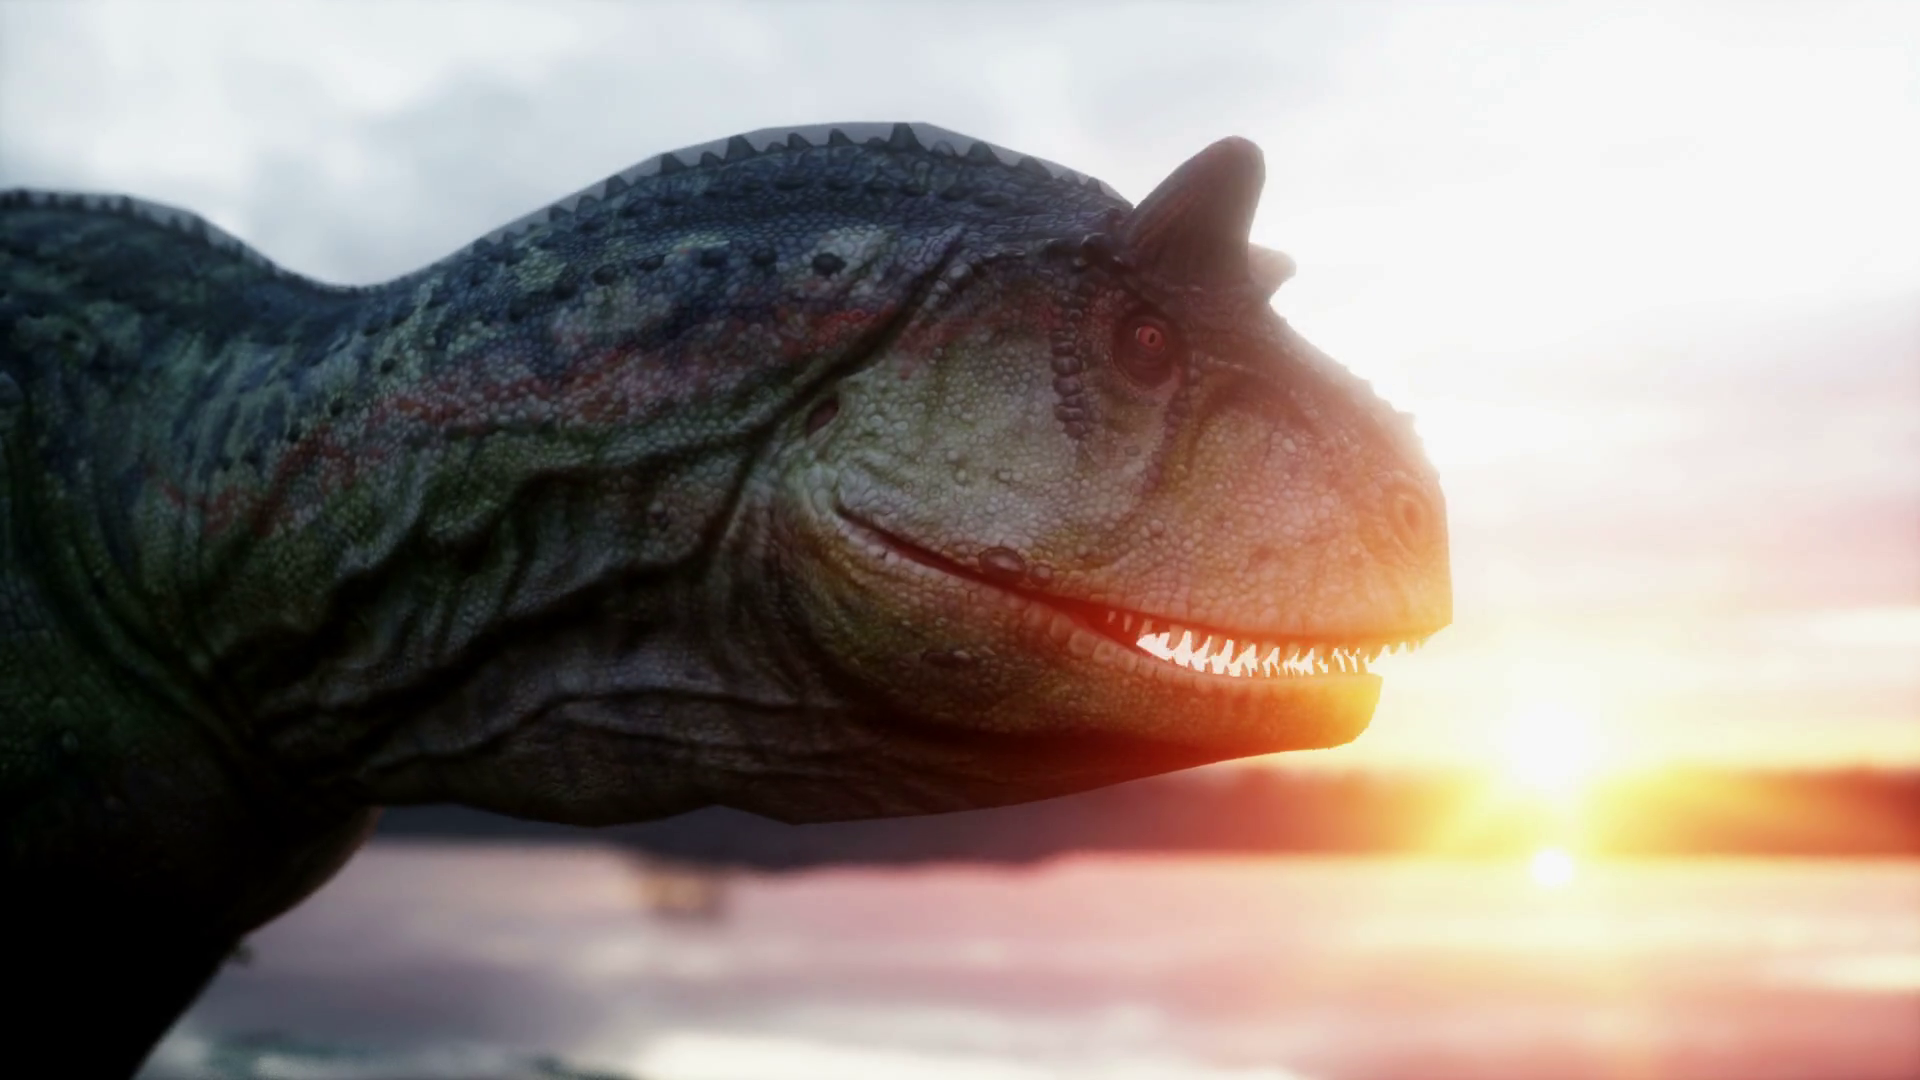 Dinosaurian